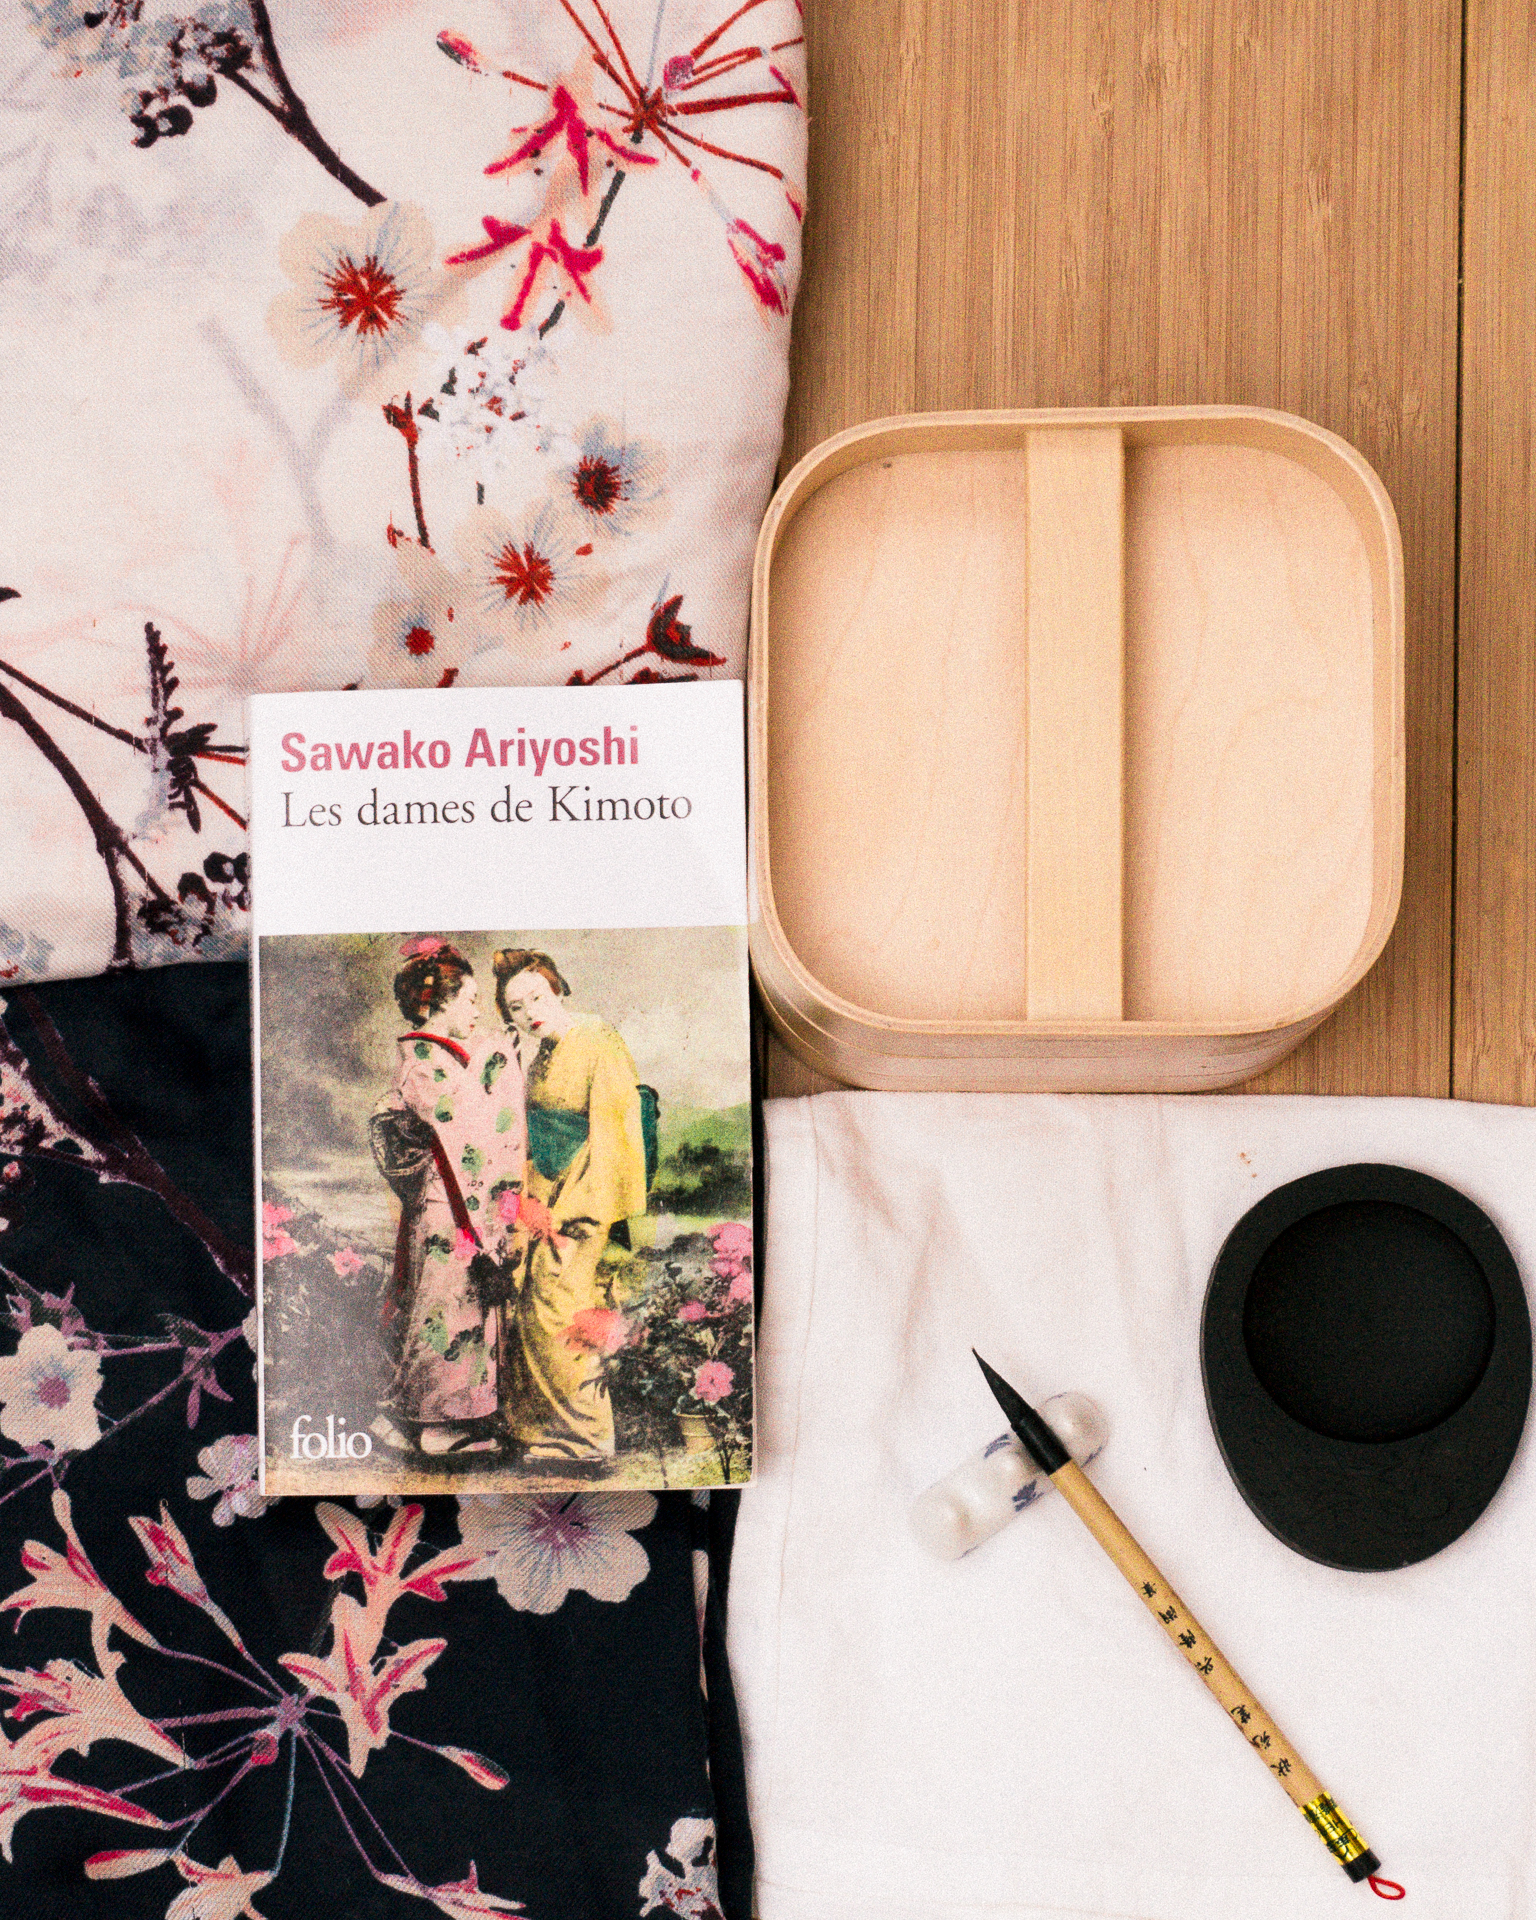 Les dames de Kimoto de Sawako Ariyoshi